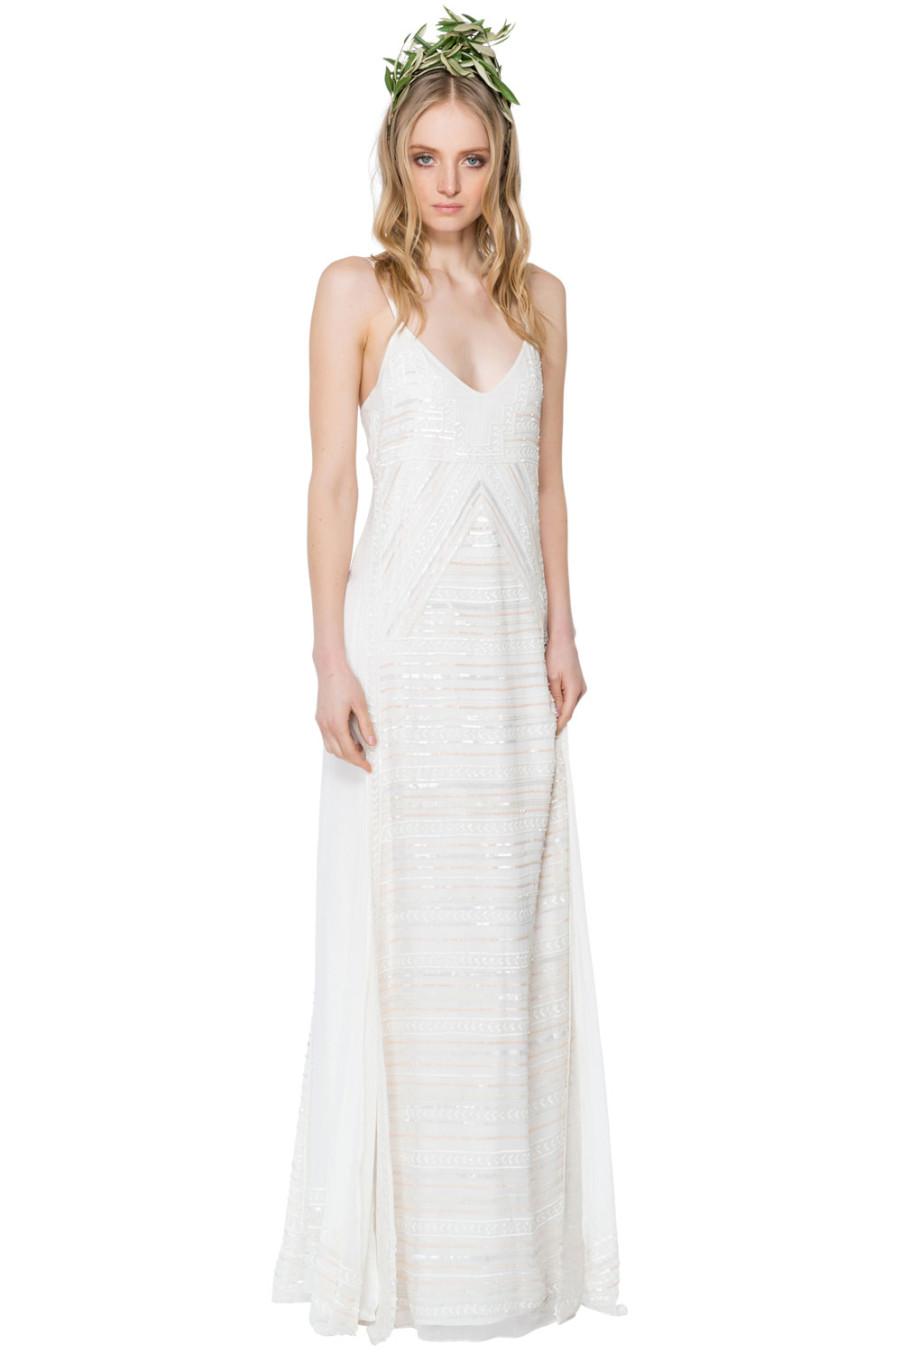 ethical wedding dress